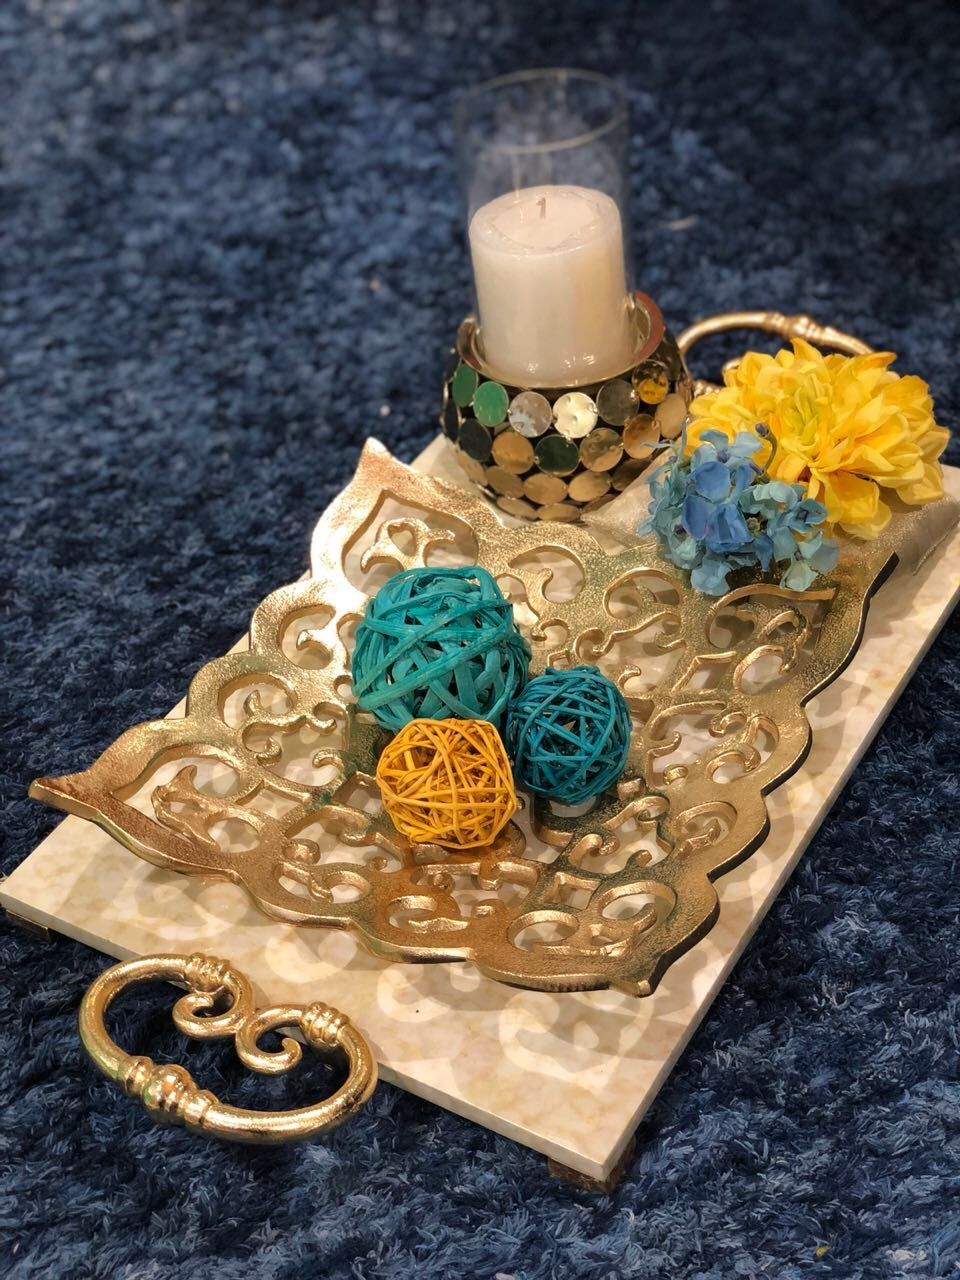 Photo From Roka Platters - By Izhaar by Core Designs